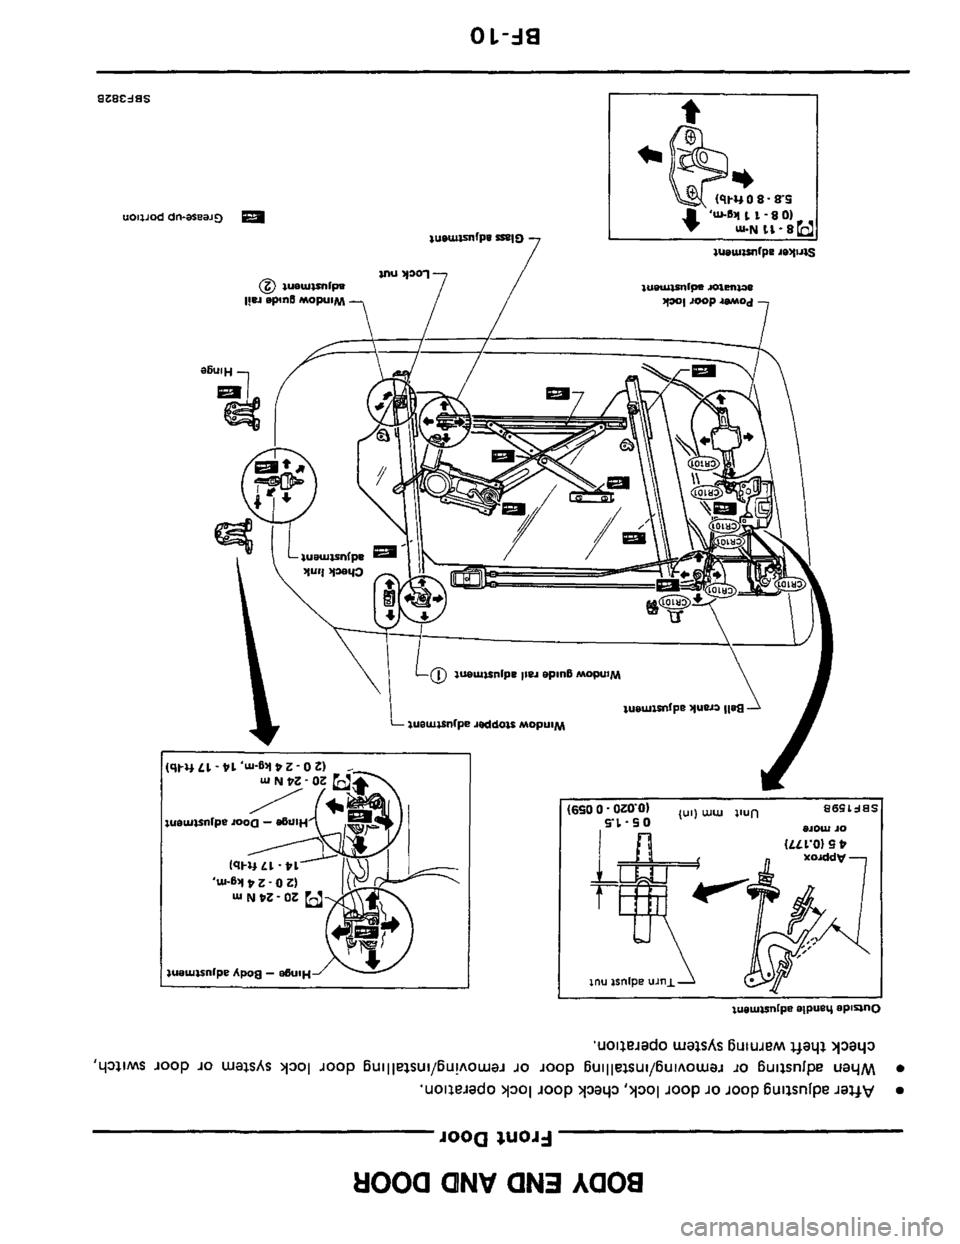 nissan 300zx 1984 z31 body workshop manual